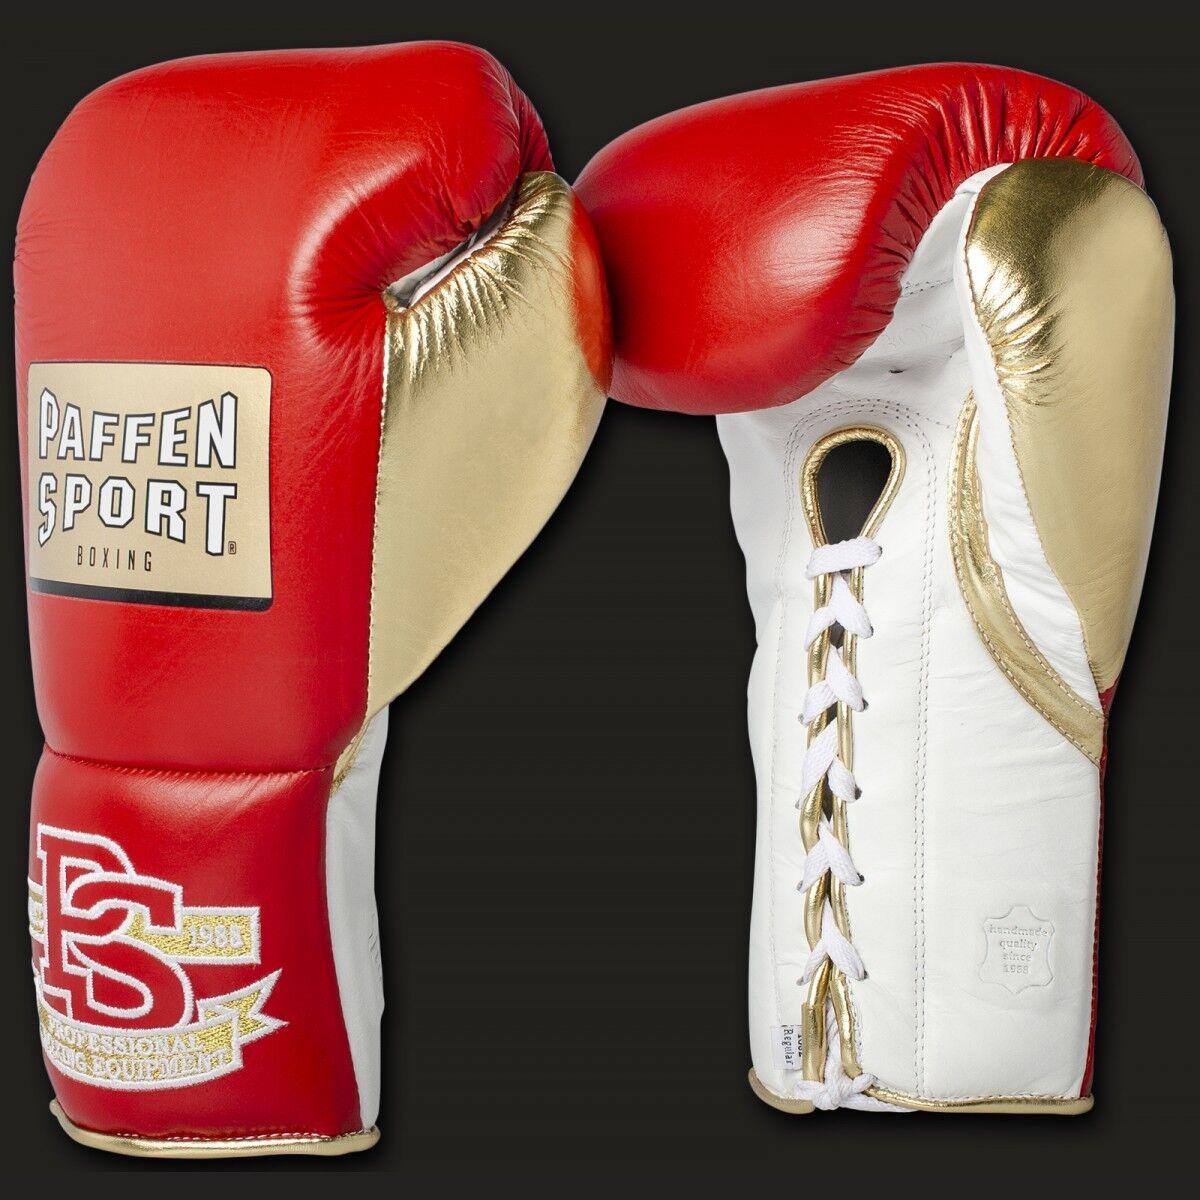 Pro Mexican Boxhandschuhe für den Wettkampf 8 & 10OZ ,Leder, Boxen, Paffen Sport